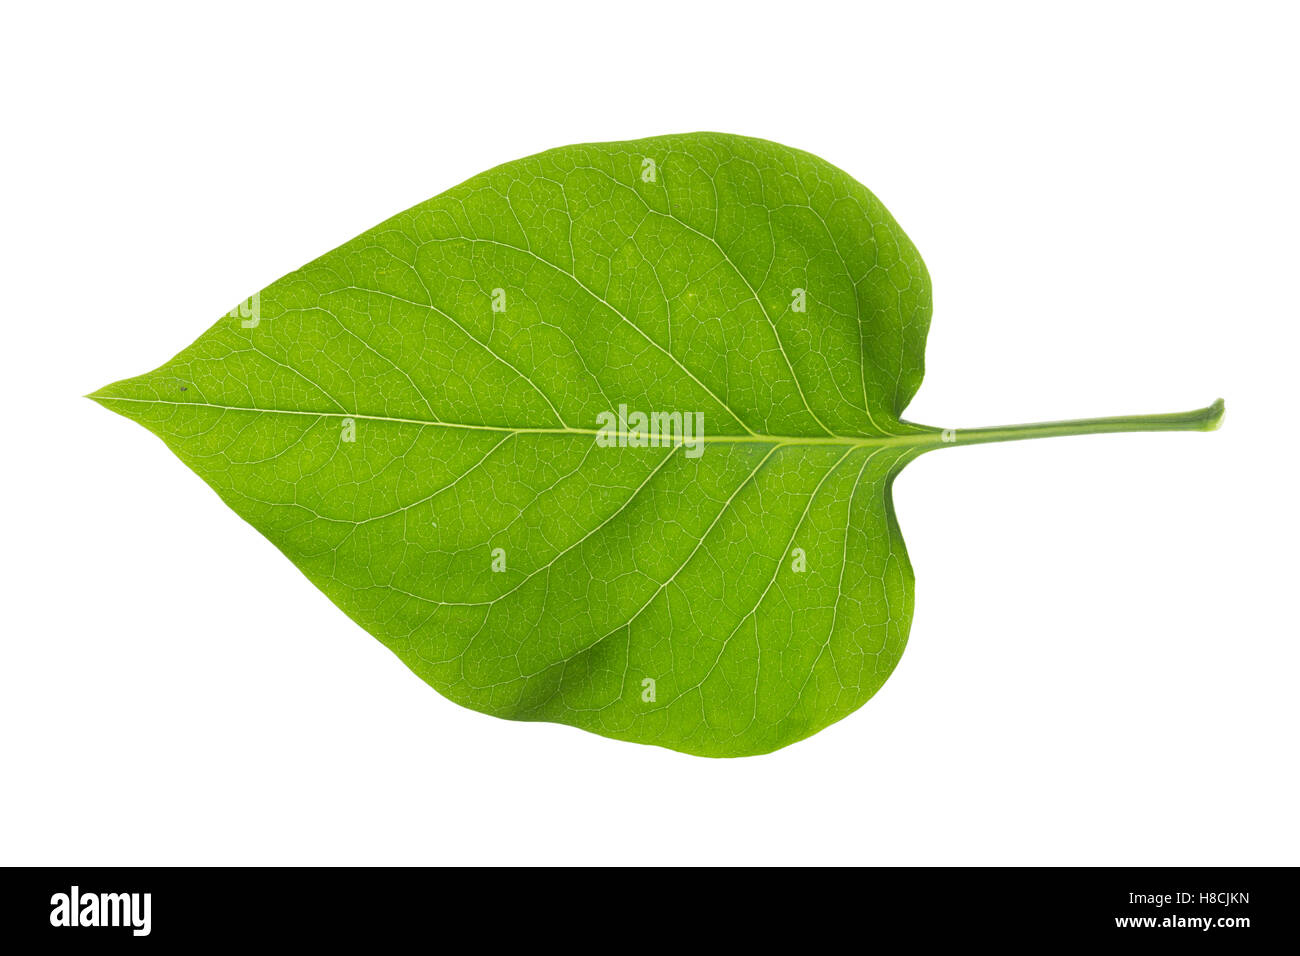 «Garten-Flieder, Flieder, Flieder, Syringa vulgaris, le lilas commun, en français, le lilas commun lilas, Photo Stock